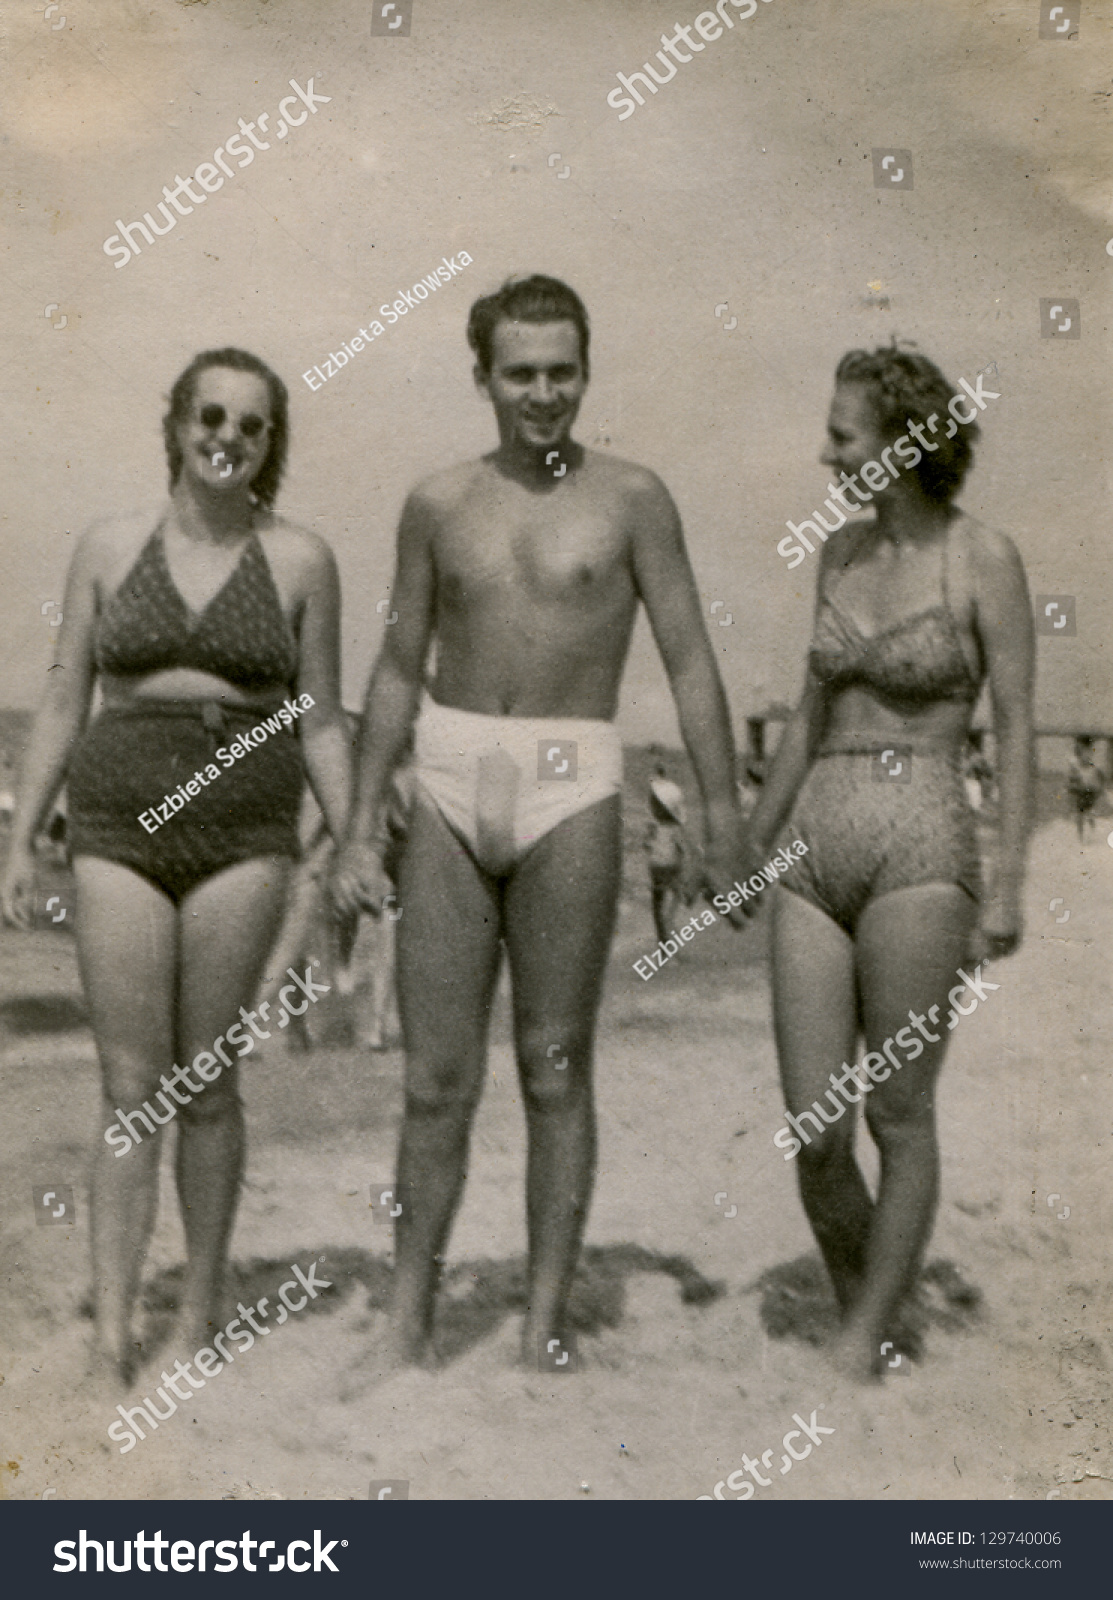 Vintage photos of women bathing